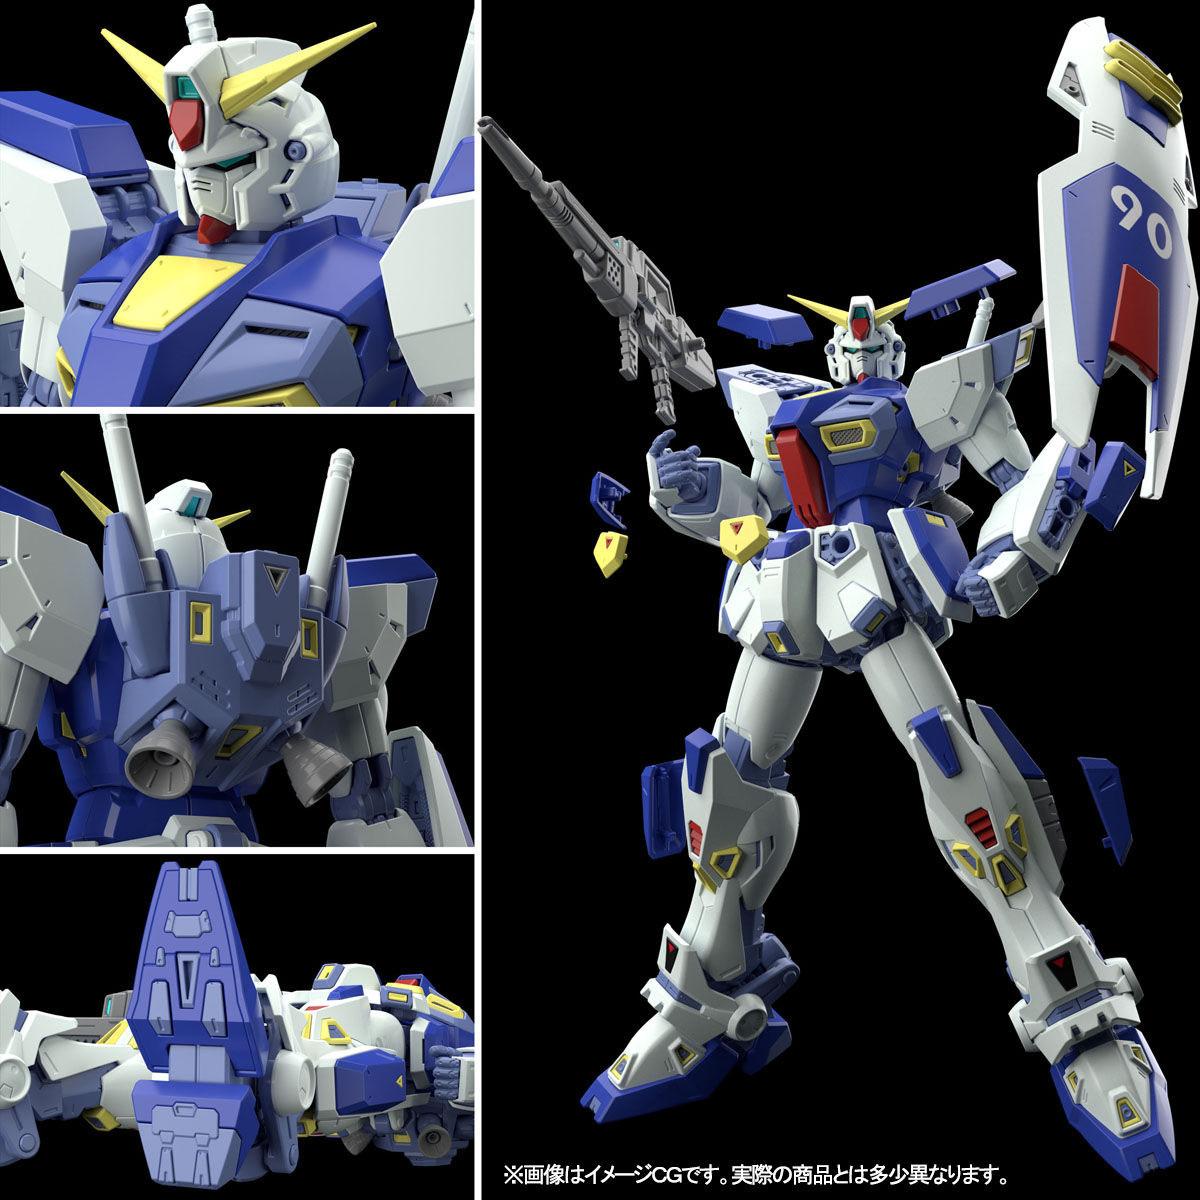 MG 1/100『ガンダムF90』プラモデル-009